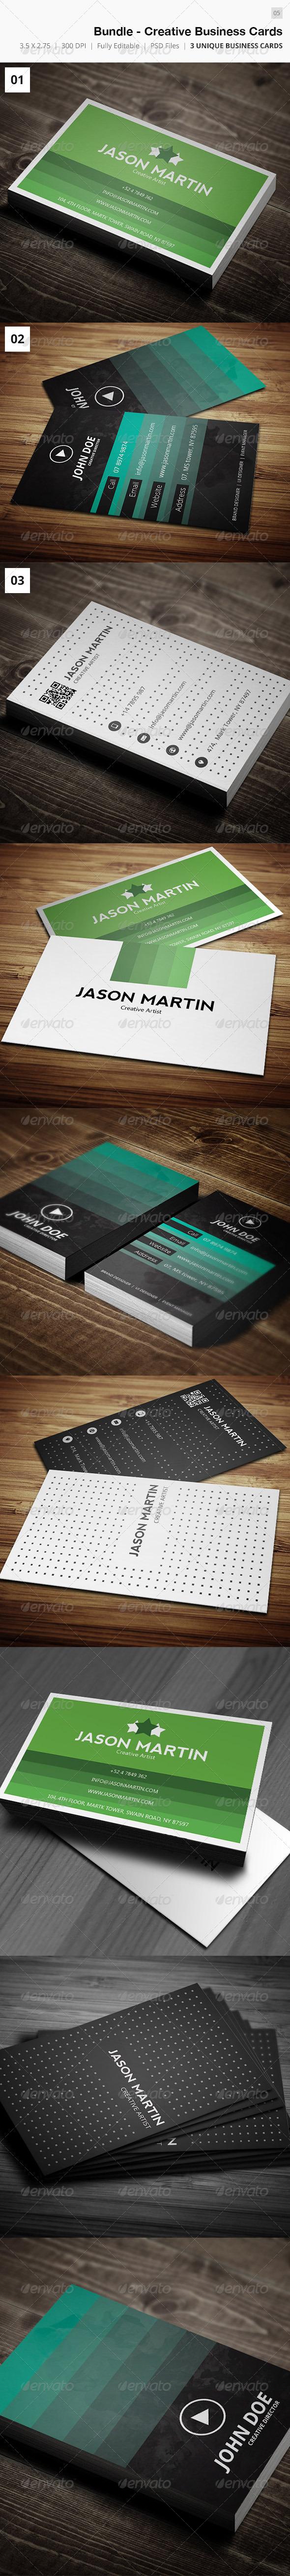 Bundle - Creative Business Card 05 - Creative Business Cards